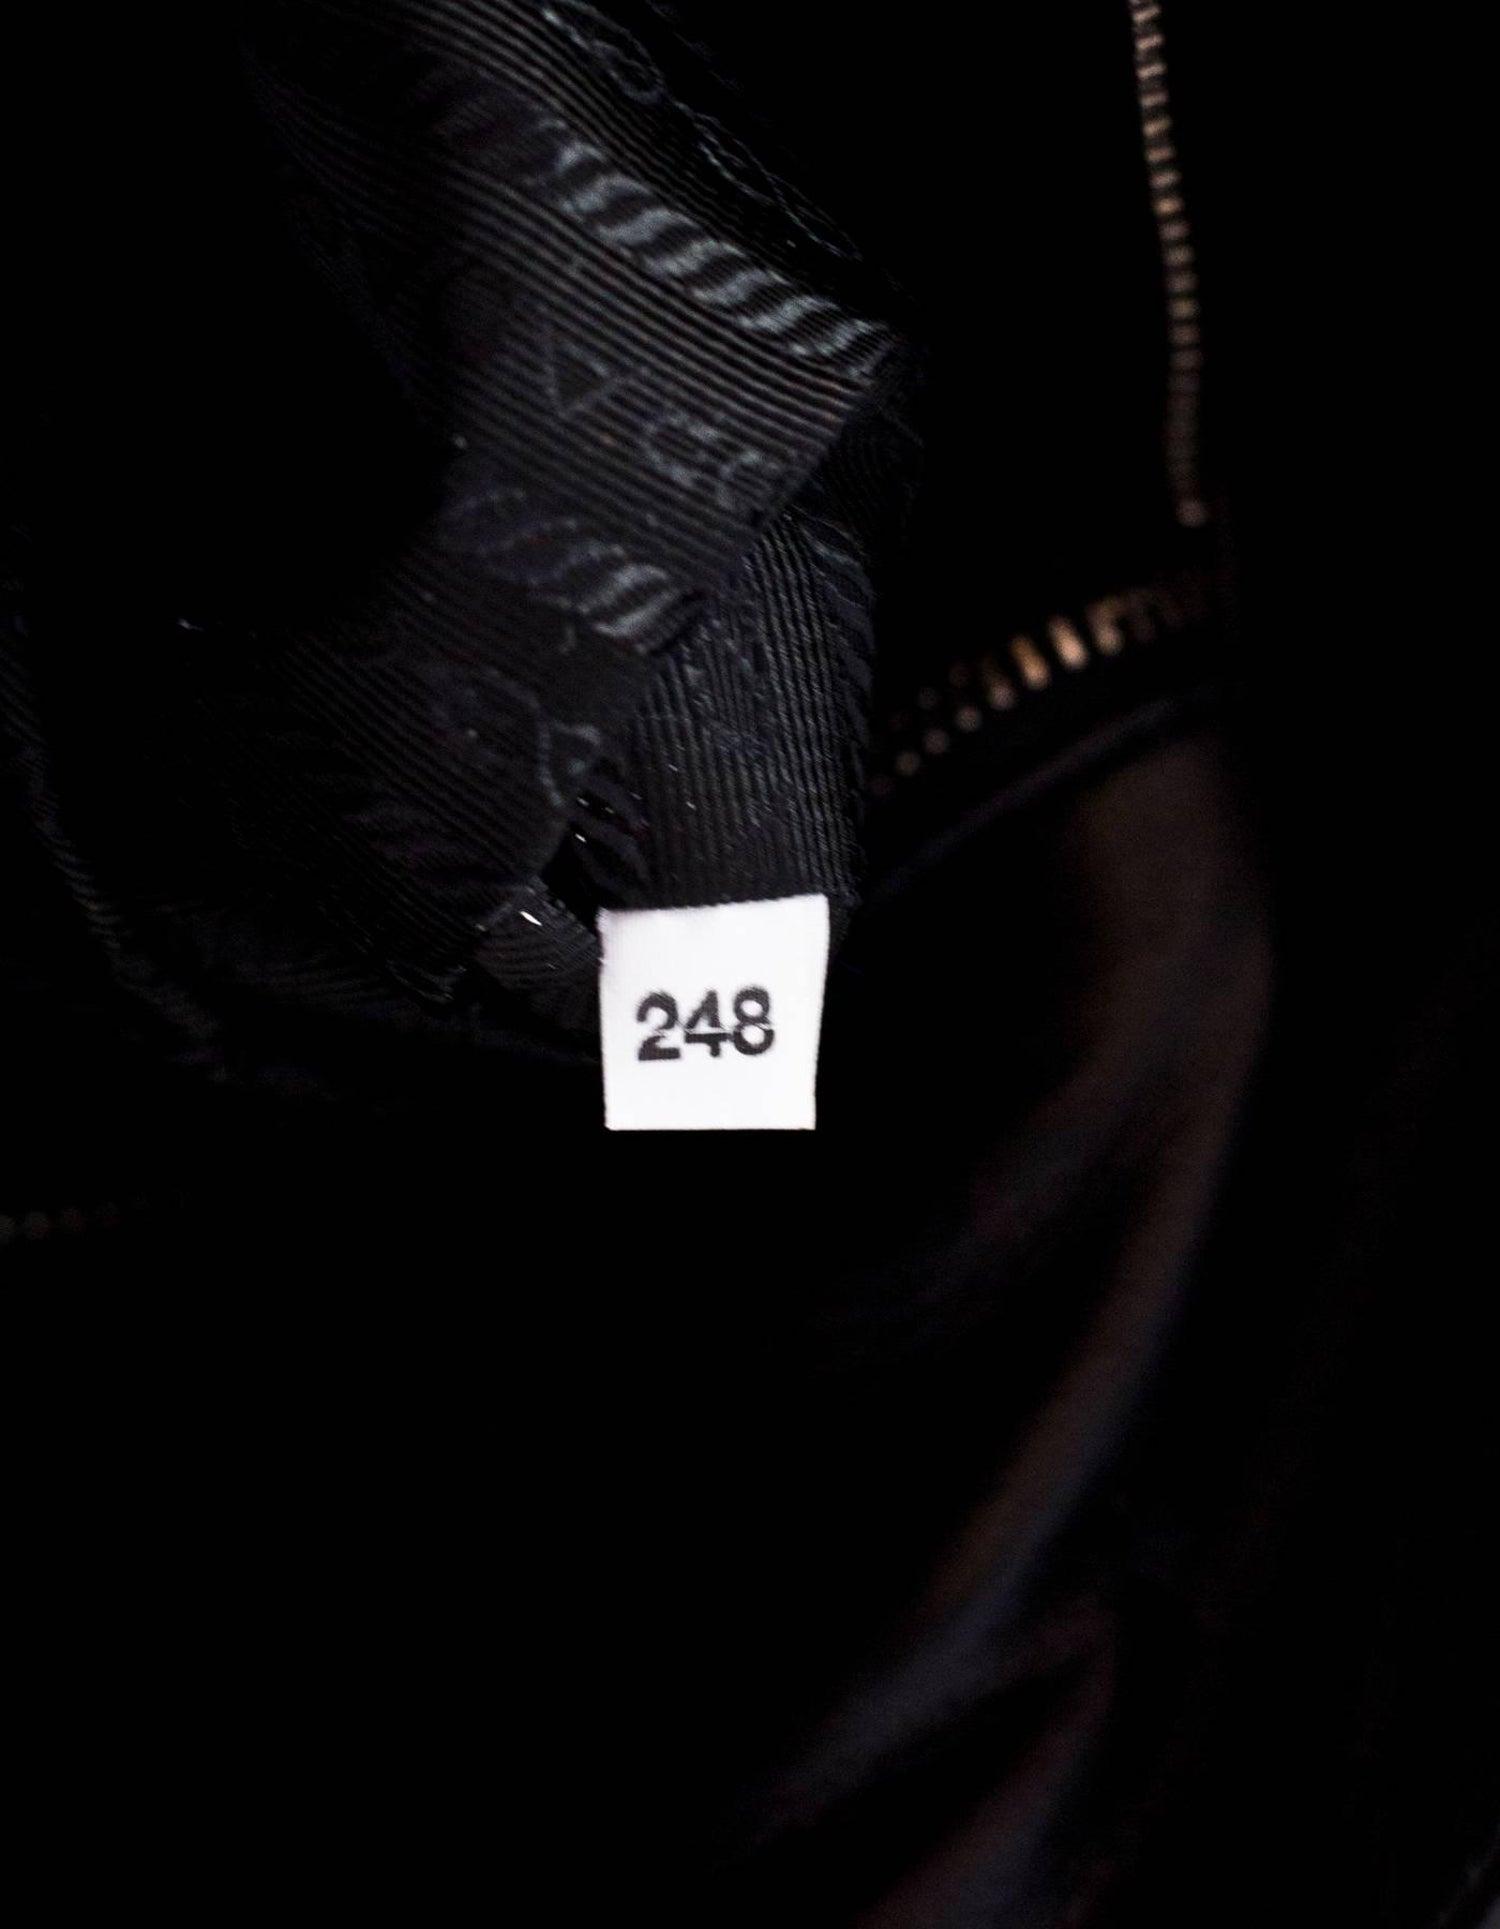 fc7fad856366 Prada Black Tessuto and Leather Grommet Tote Bag at 1stdibs